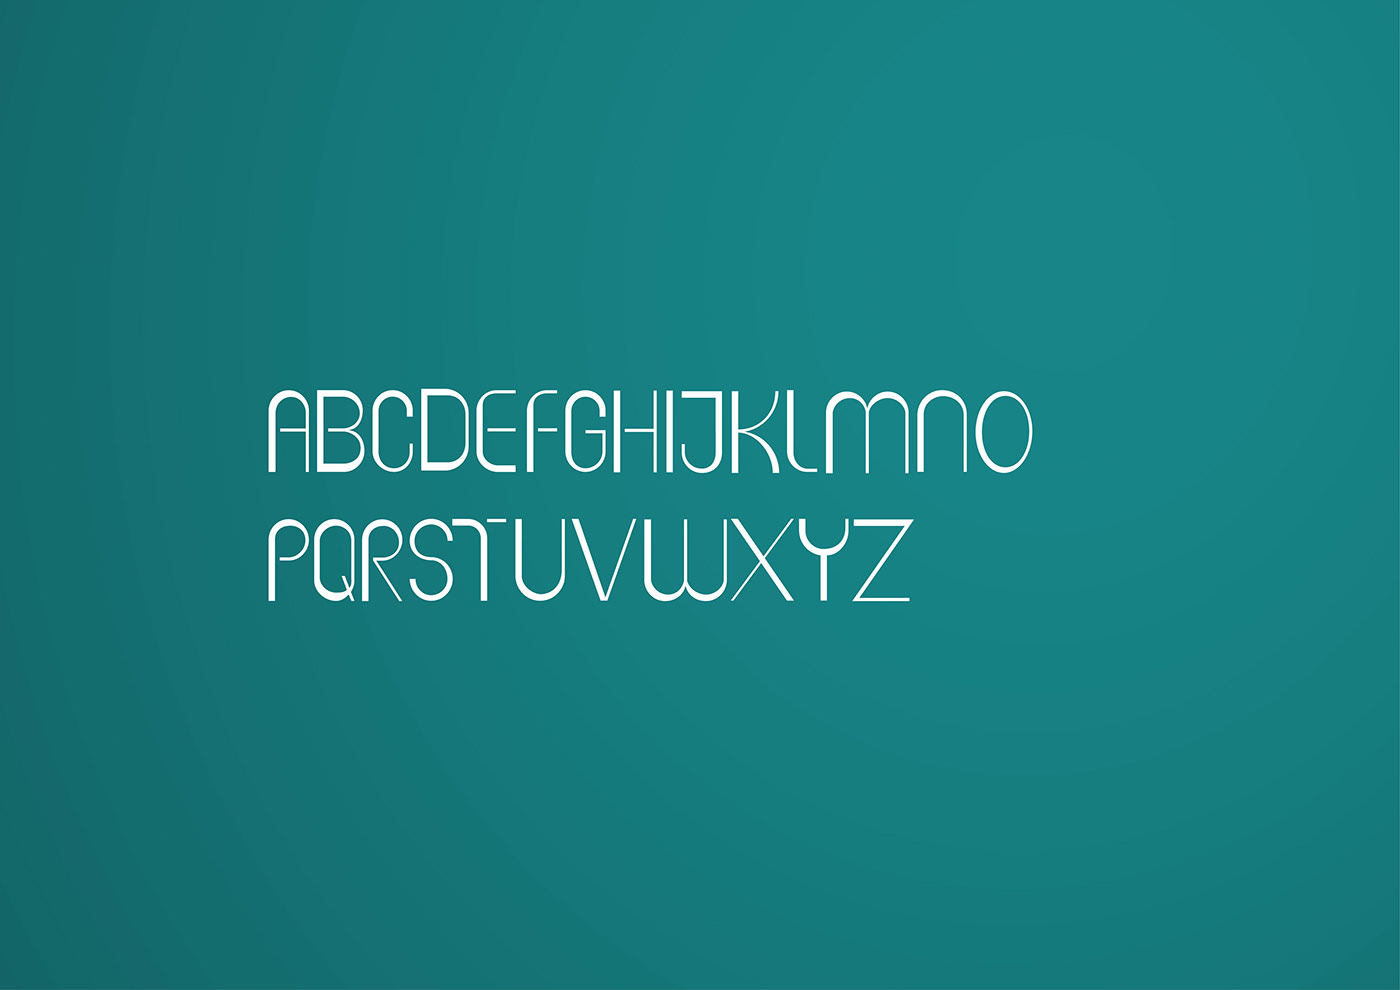 Image may contain: screenshot, turquoise and aqua